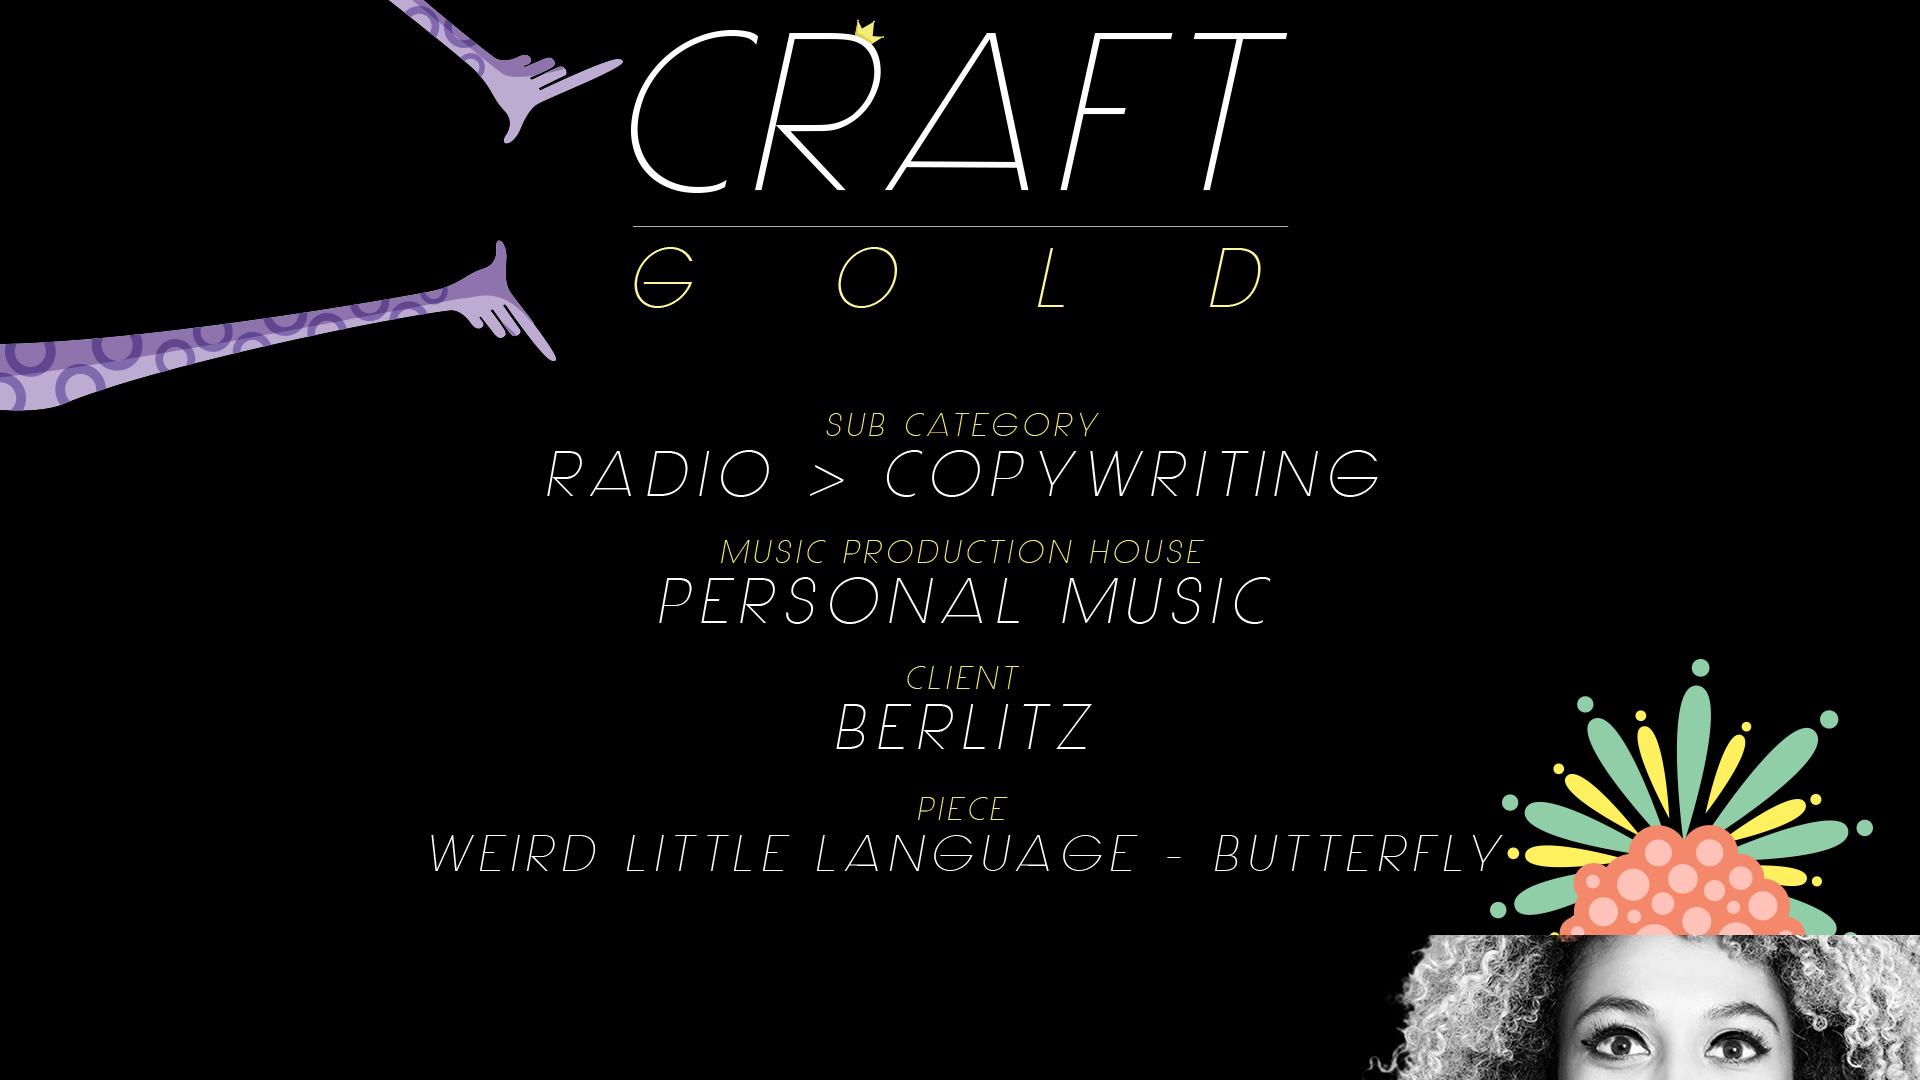 PLACAS GOLD-craft-RADIO - COPYWRITING.png